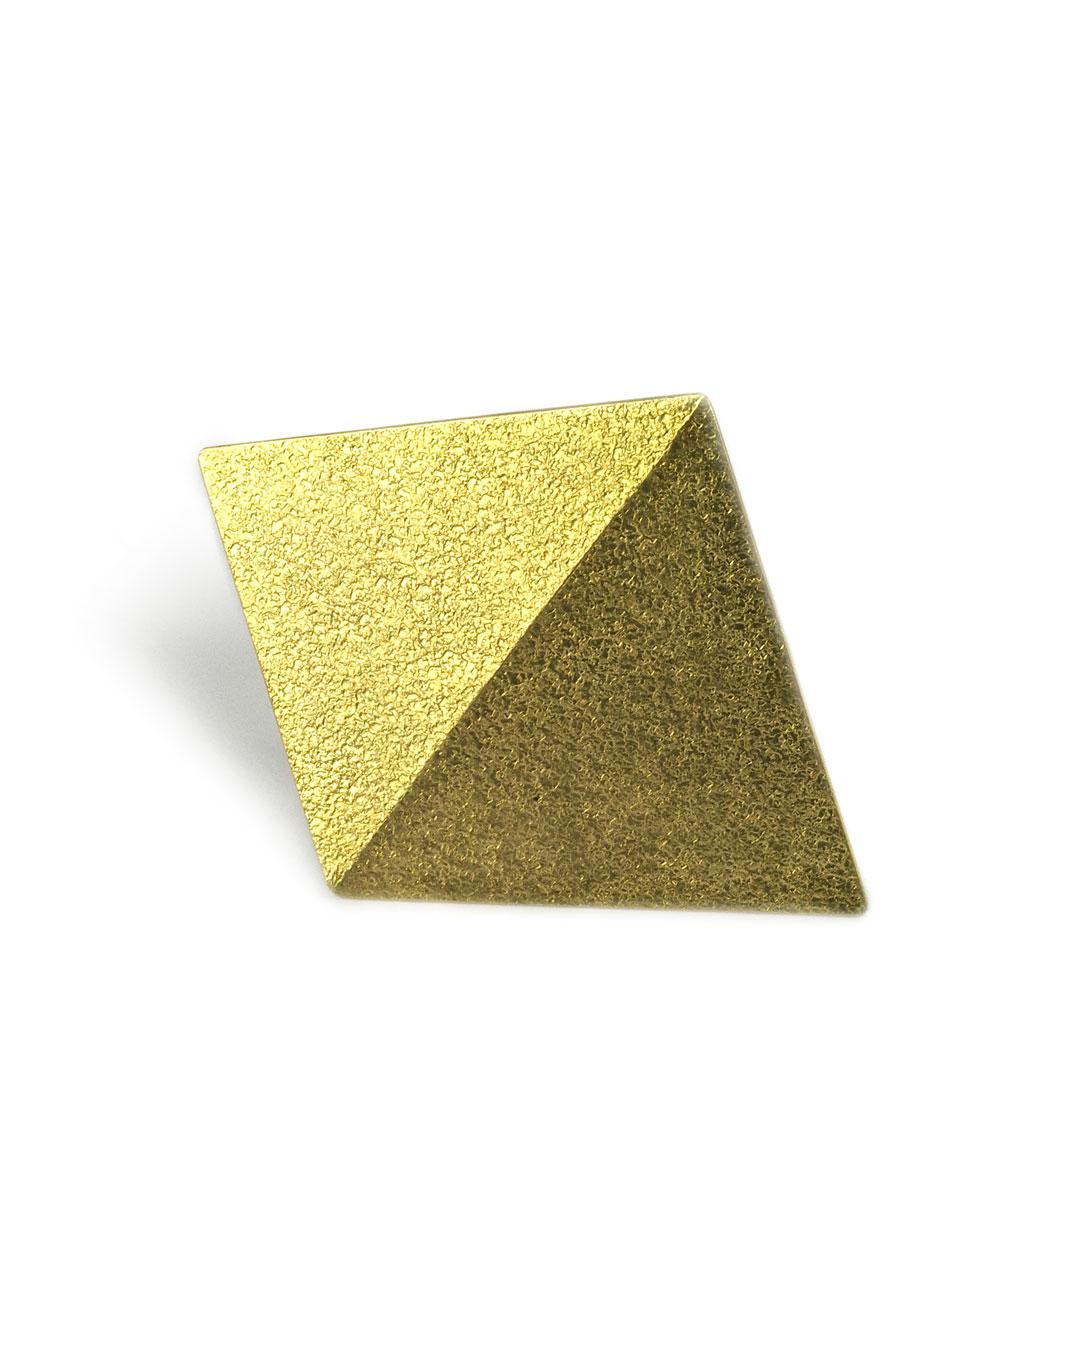 Okinari Kurokawa, untitled, 2007, brooch; 20ct gold, stainless steel, 45 x 56 x 5 mm, €1700